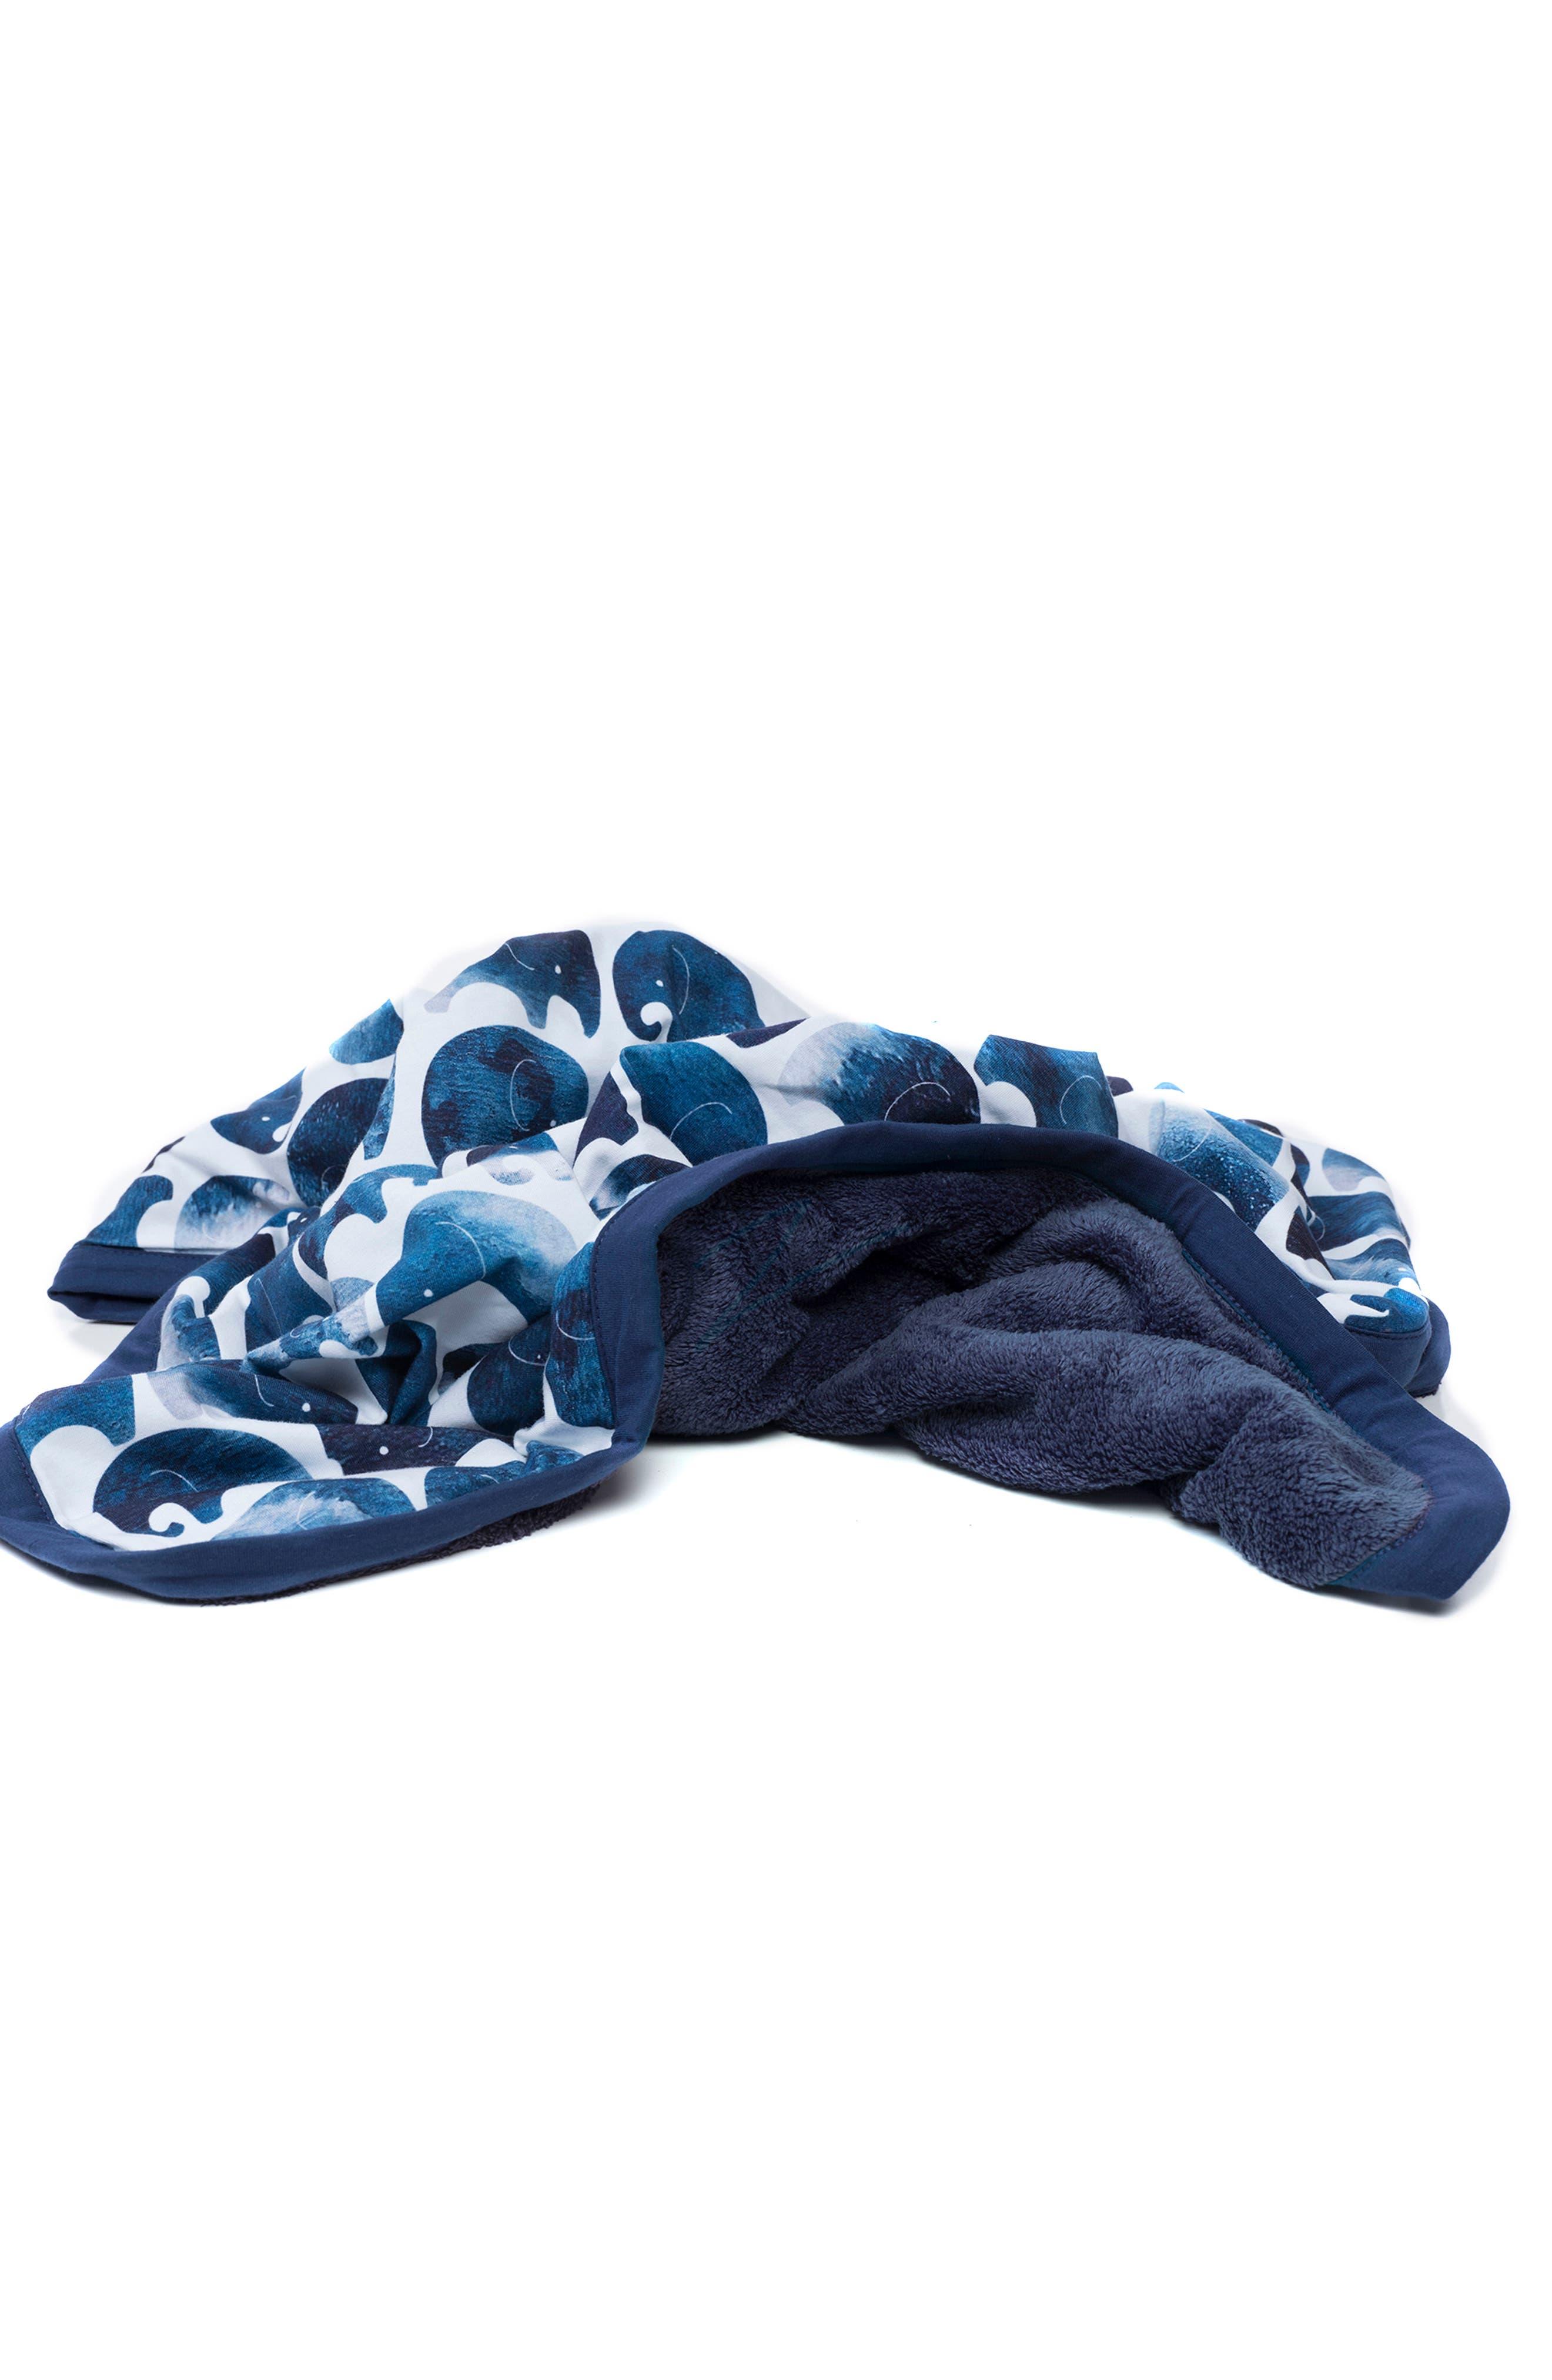 Elefant Cuddle Blanket,                             Alternate thumbnail 3, color,                             Elefant